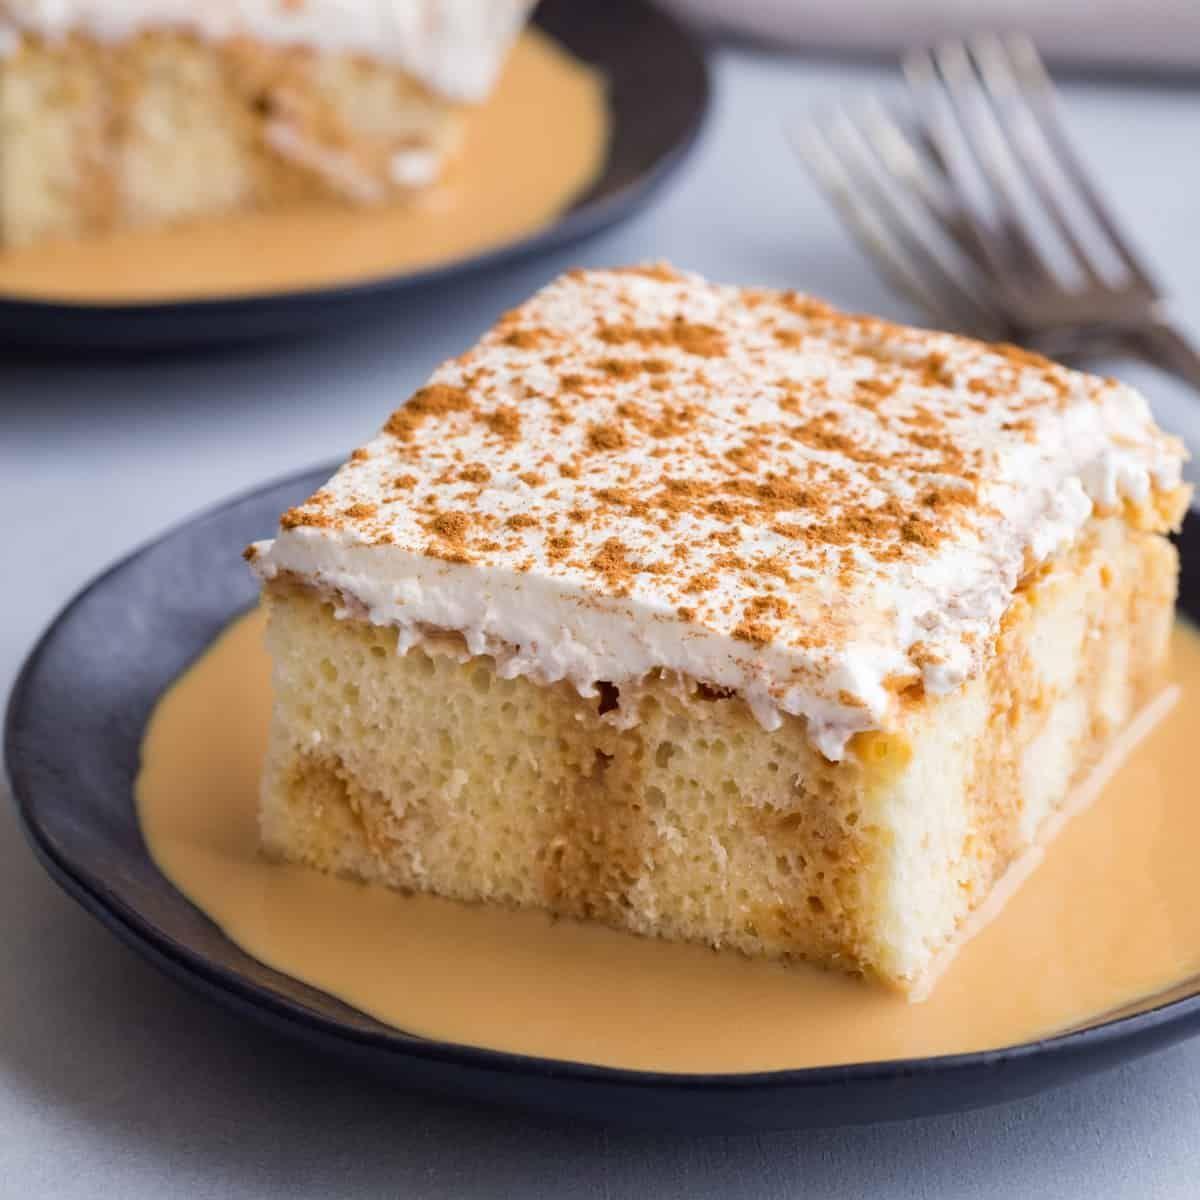 Pin on yummy dessert recipes